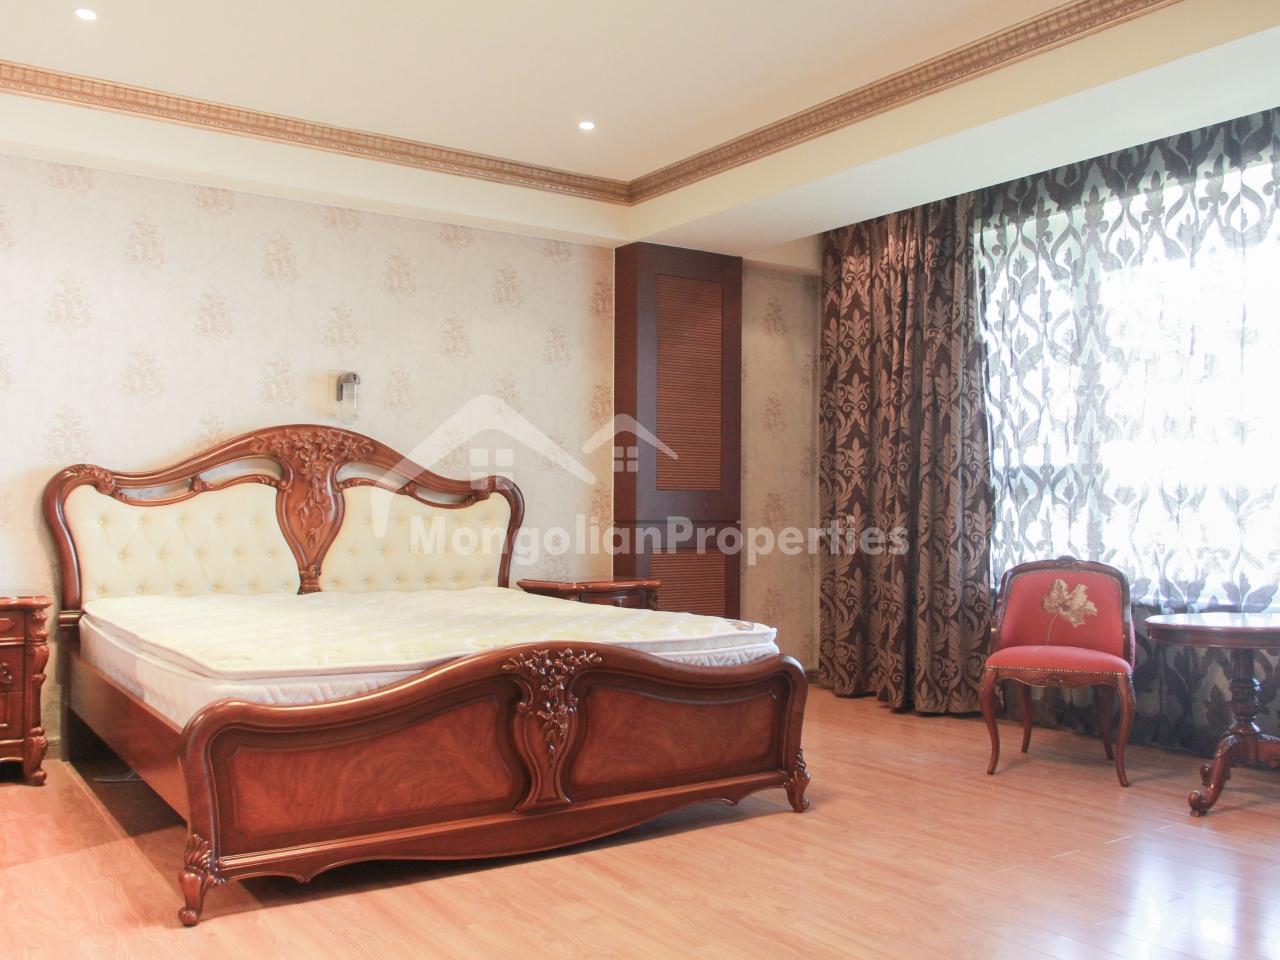 Super nice 3 bedroom 240sqm apartment for rent